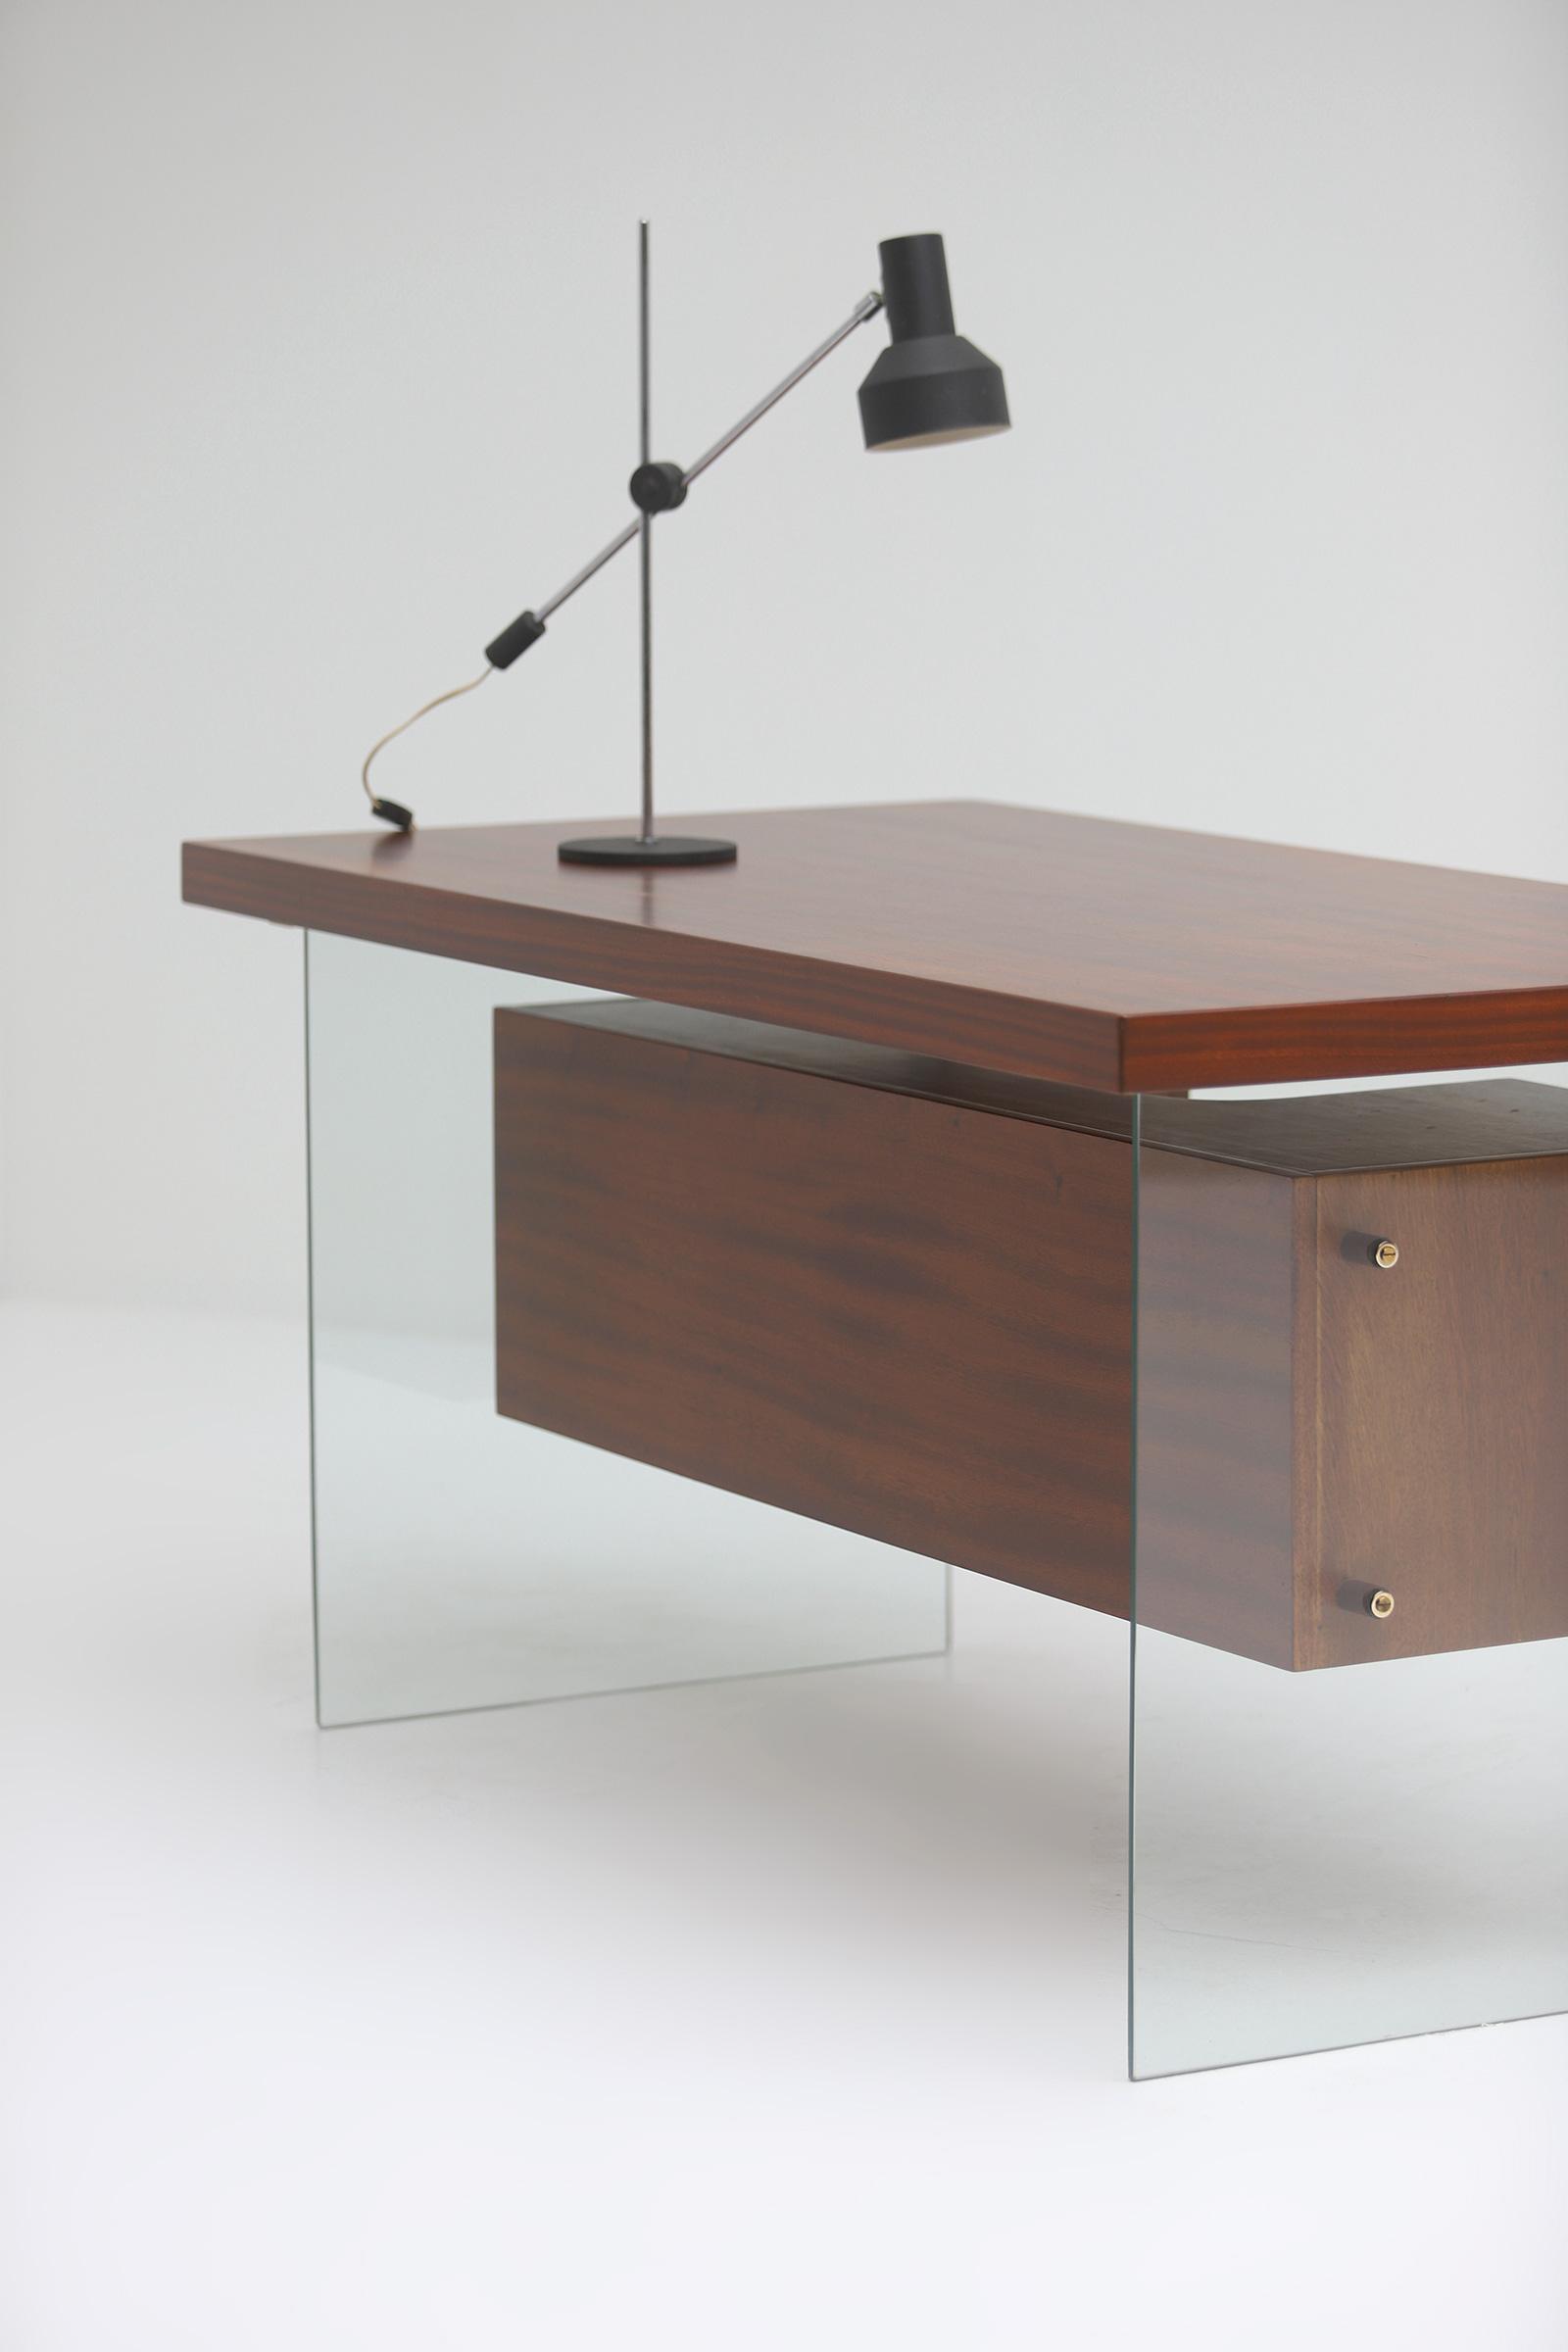 Modernist desk in the manner of Jacques Dumond, 1950simage 4